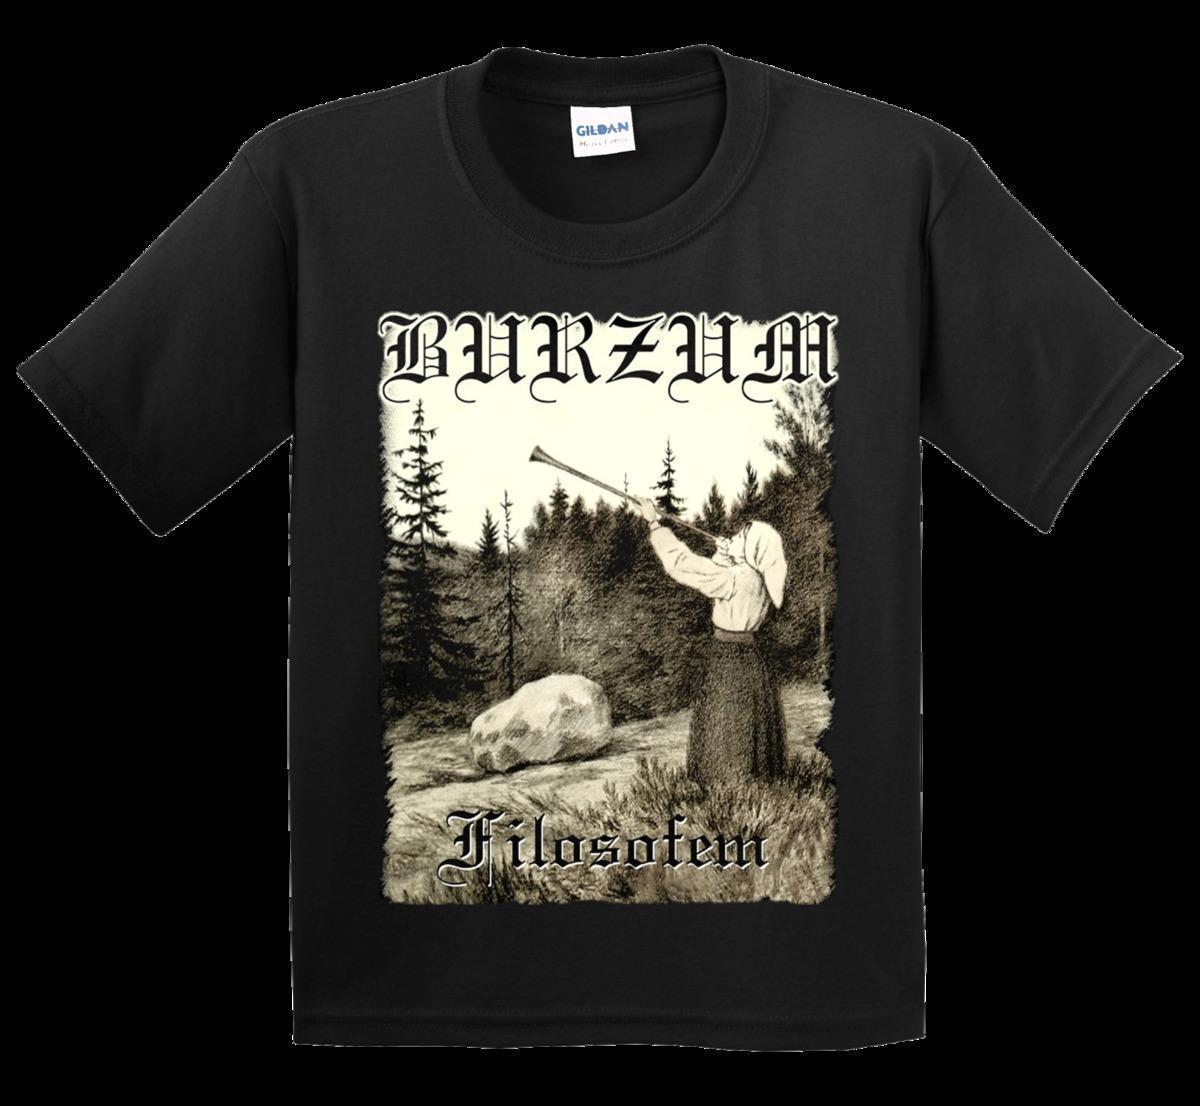 6b78448c7 Muzrub Filosofem T Shirt Black Metal Death Mayhem Beherit Old Funeral  Bathory 100% Cotton Men T Shirt Tees Custom Top Tee T Shirt Sites Quirky T  Shirts From ...